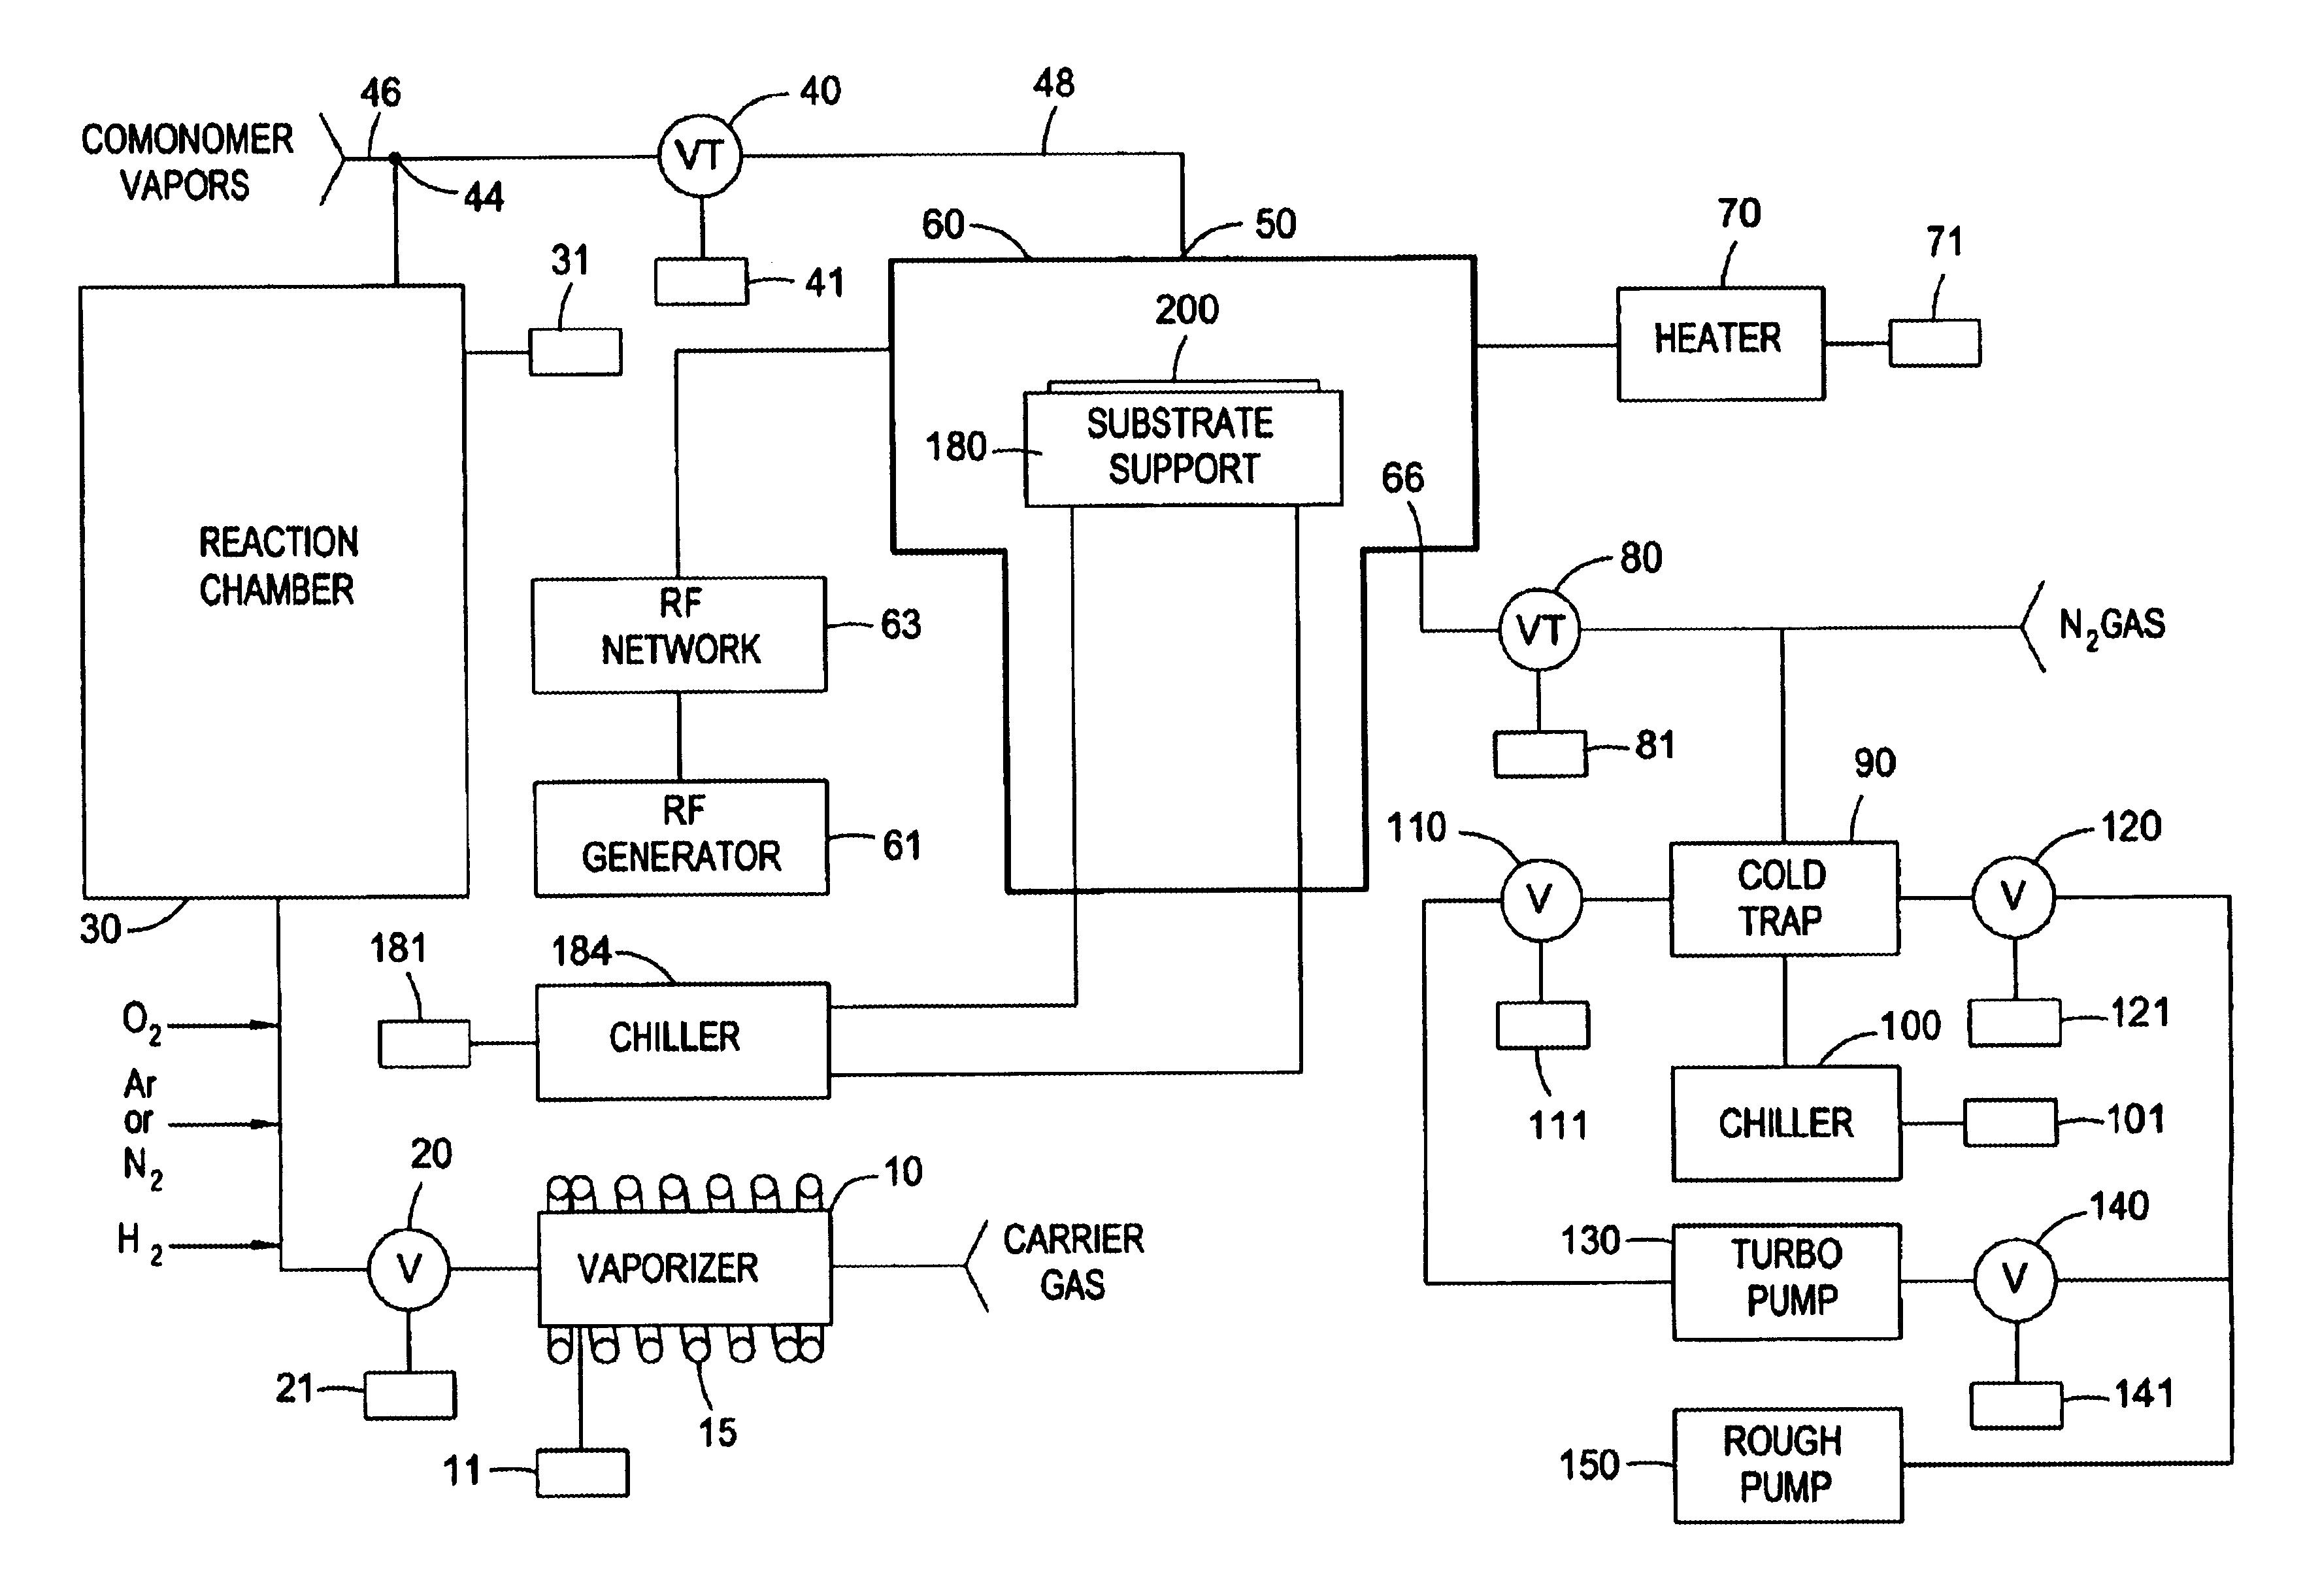 Watlow Heater Wiring Diagram Watlow Temperature Controller